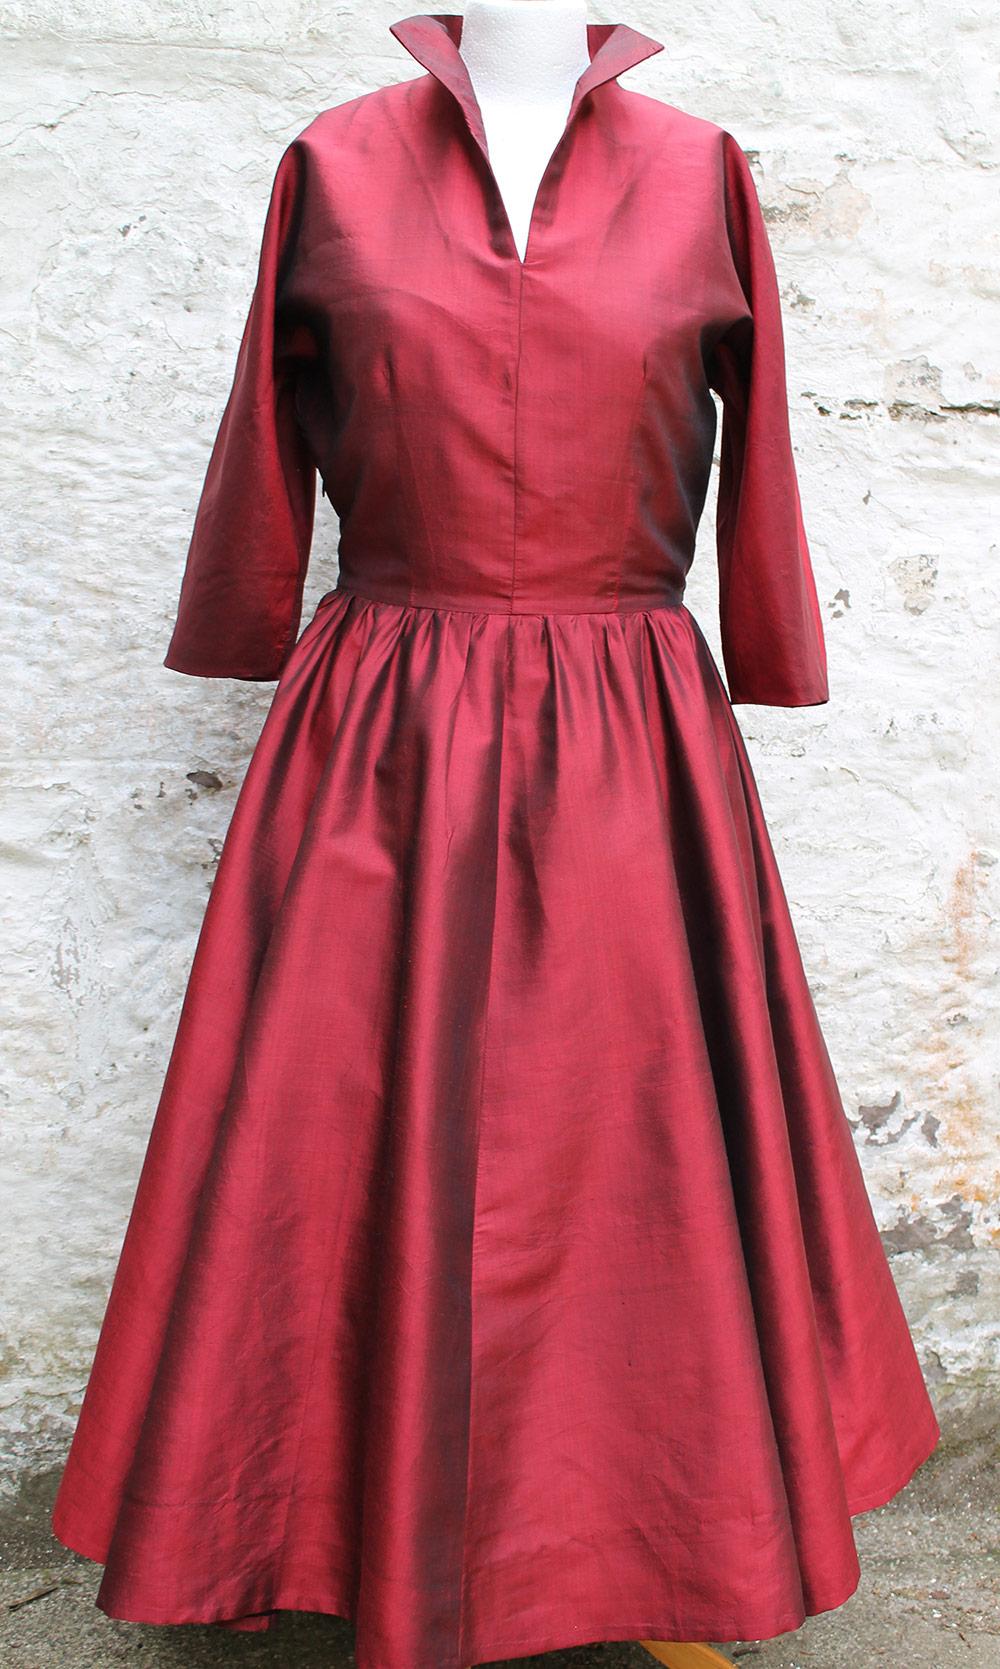 Ethical Silk Taffeta Dress